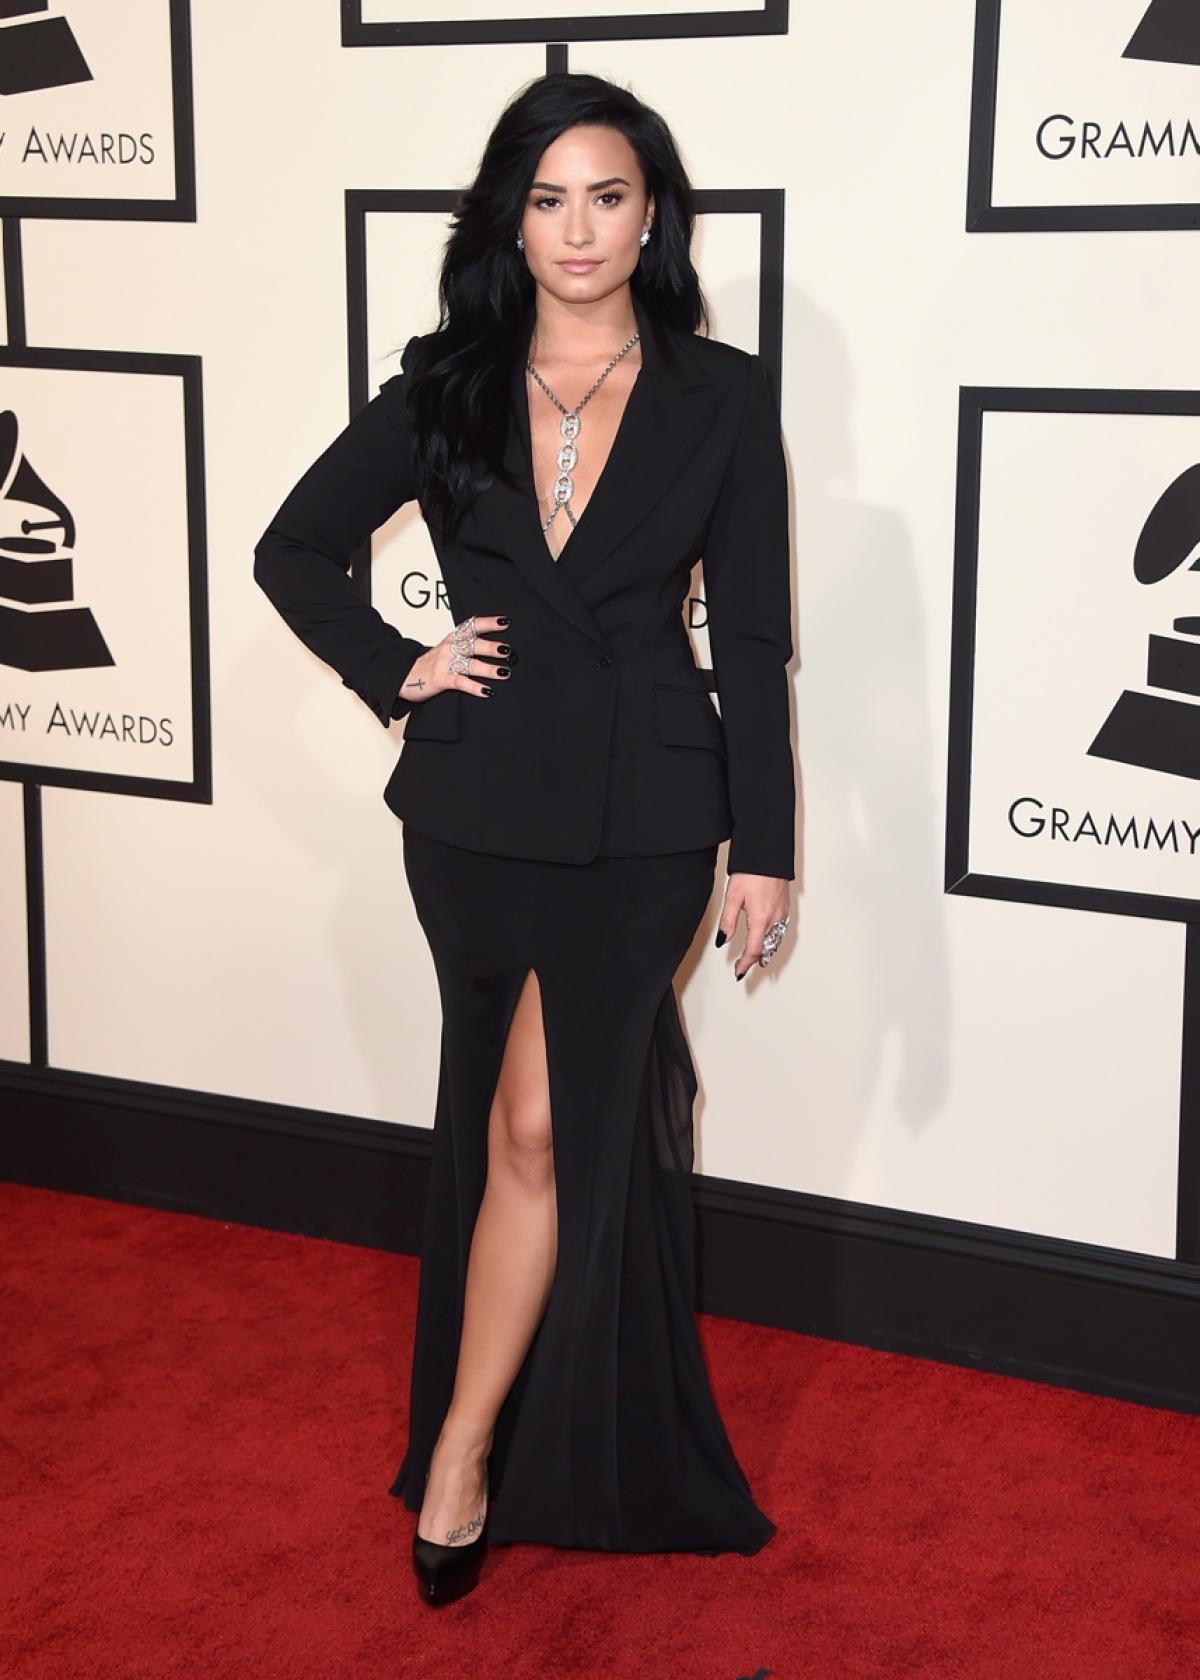 Grammy Awards 2016: My Favorite Top 15 Red Carpet Dresses | HuffPost